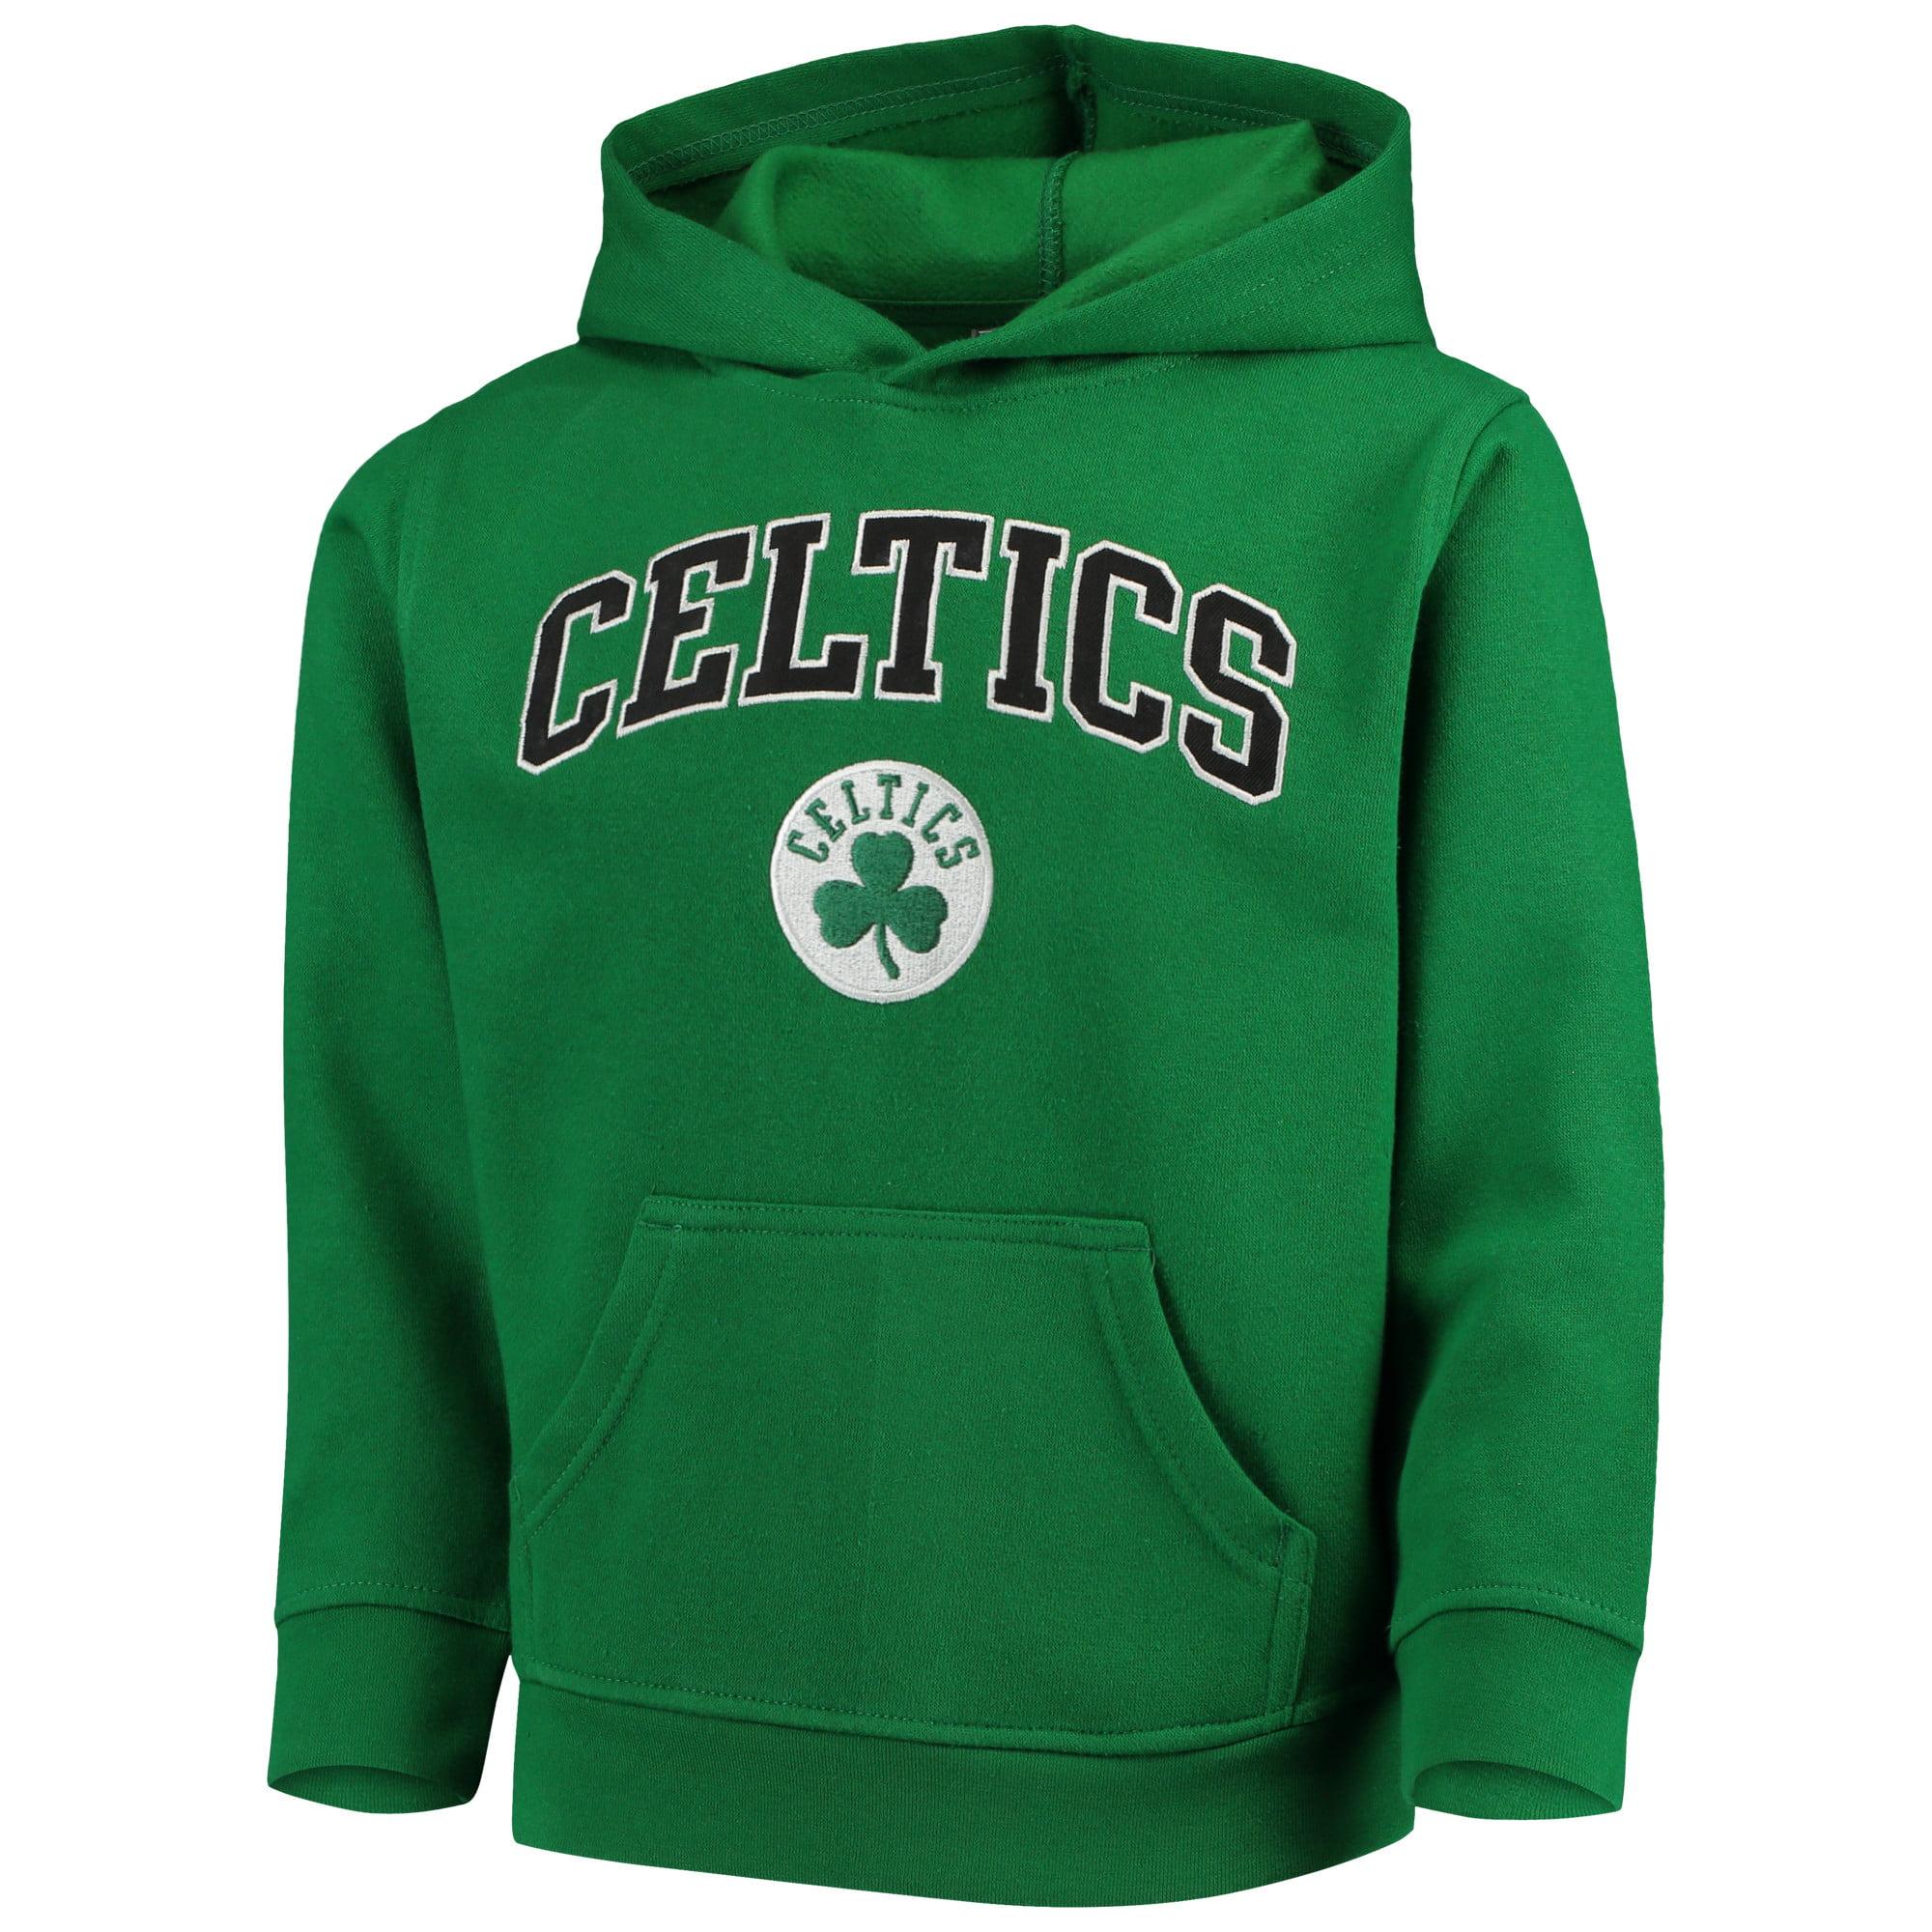 Youth Kelly Green Boston Celtics Team Fleece Pullover Hoodie